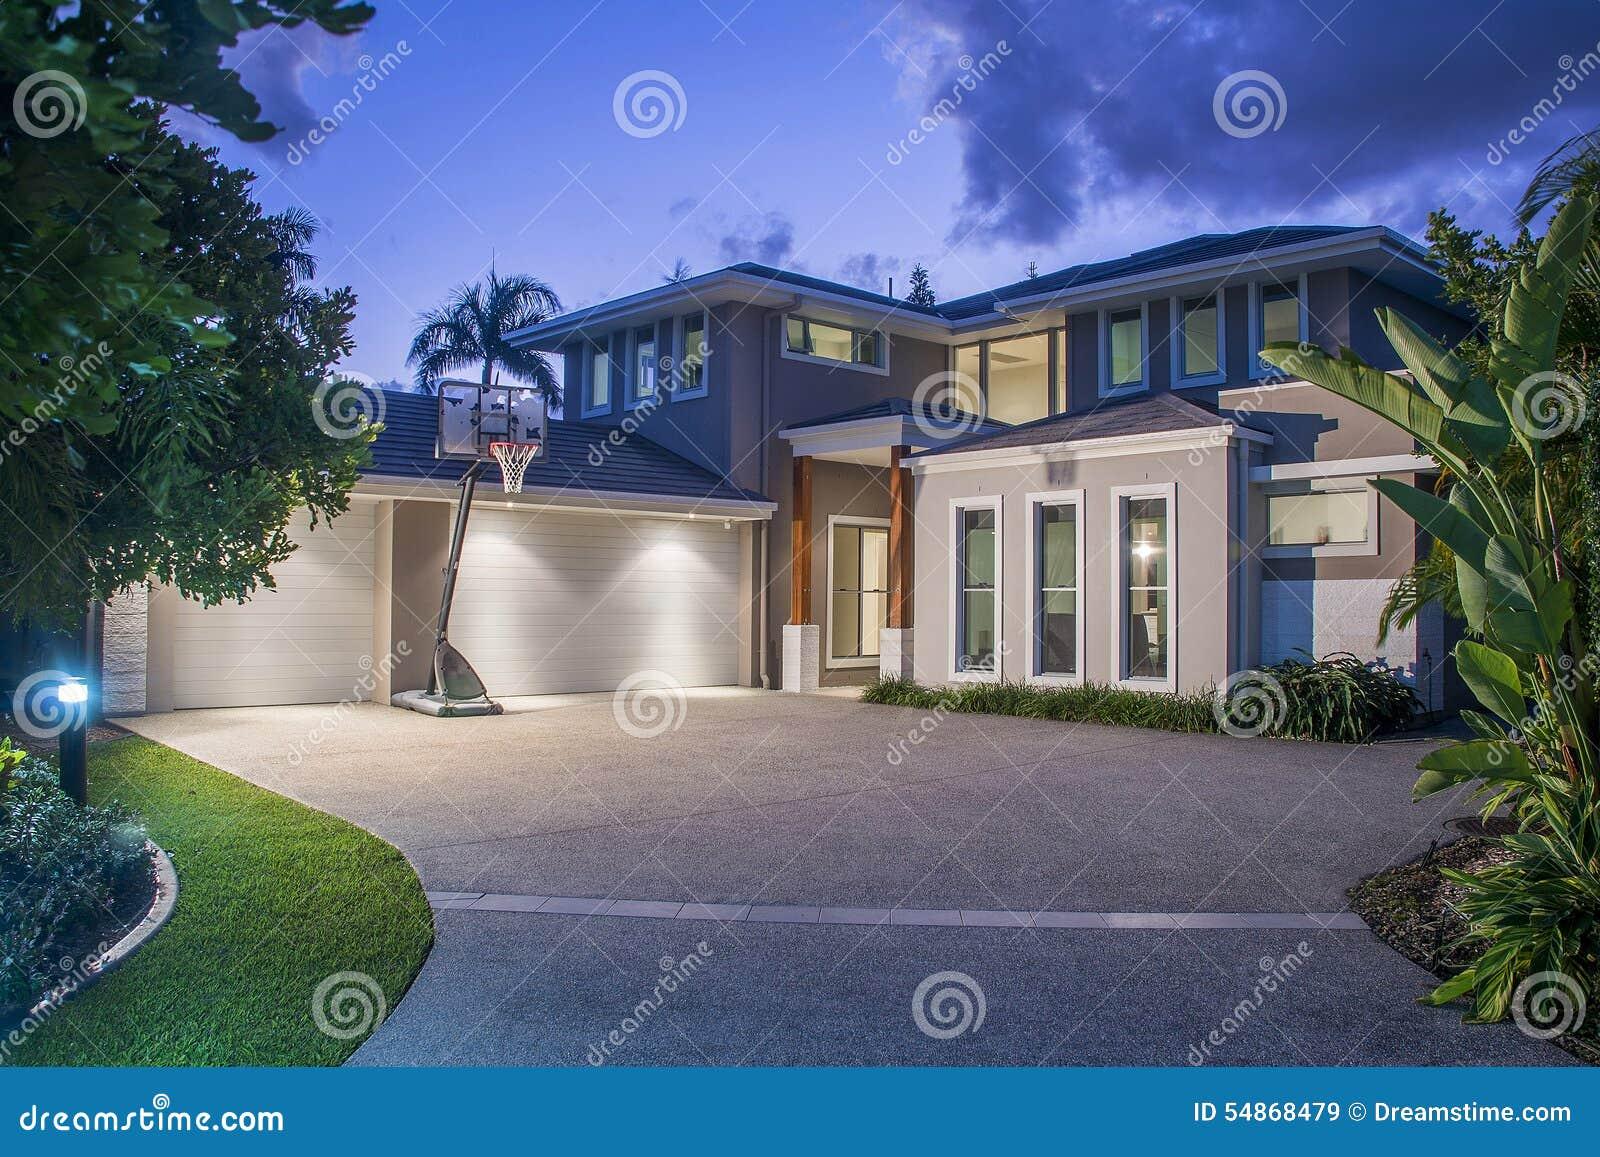 Luxury Homes Stock Photo Image 54868479